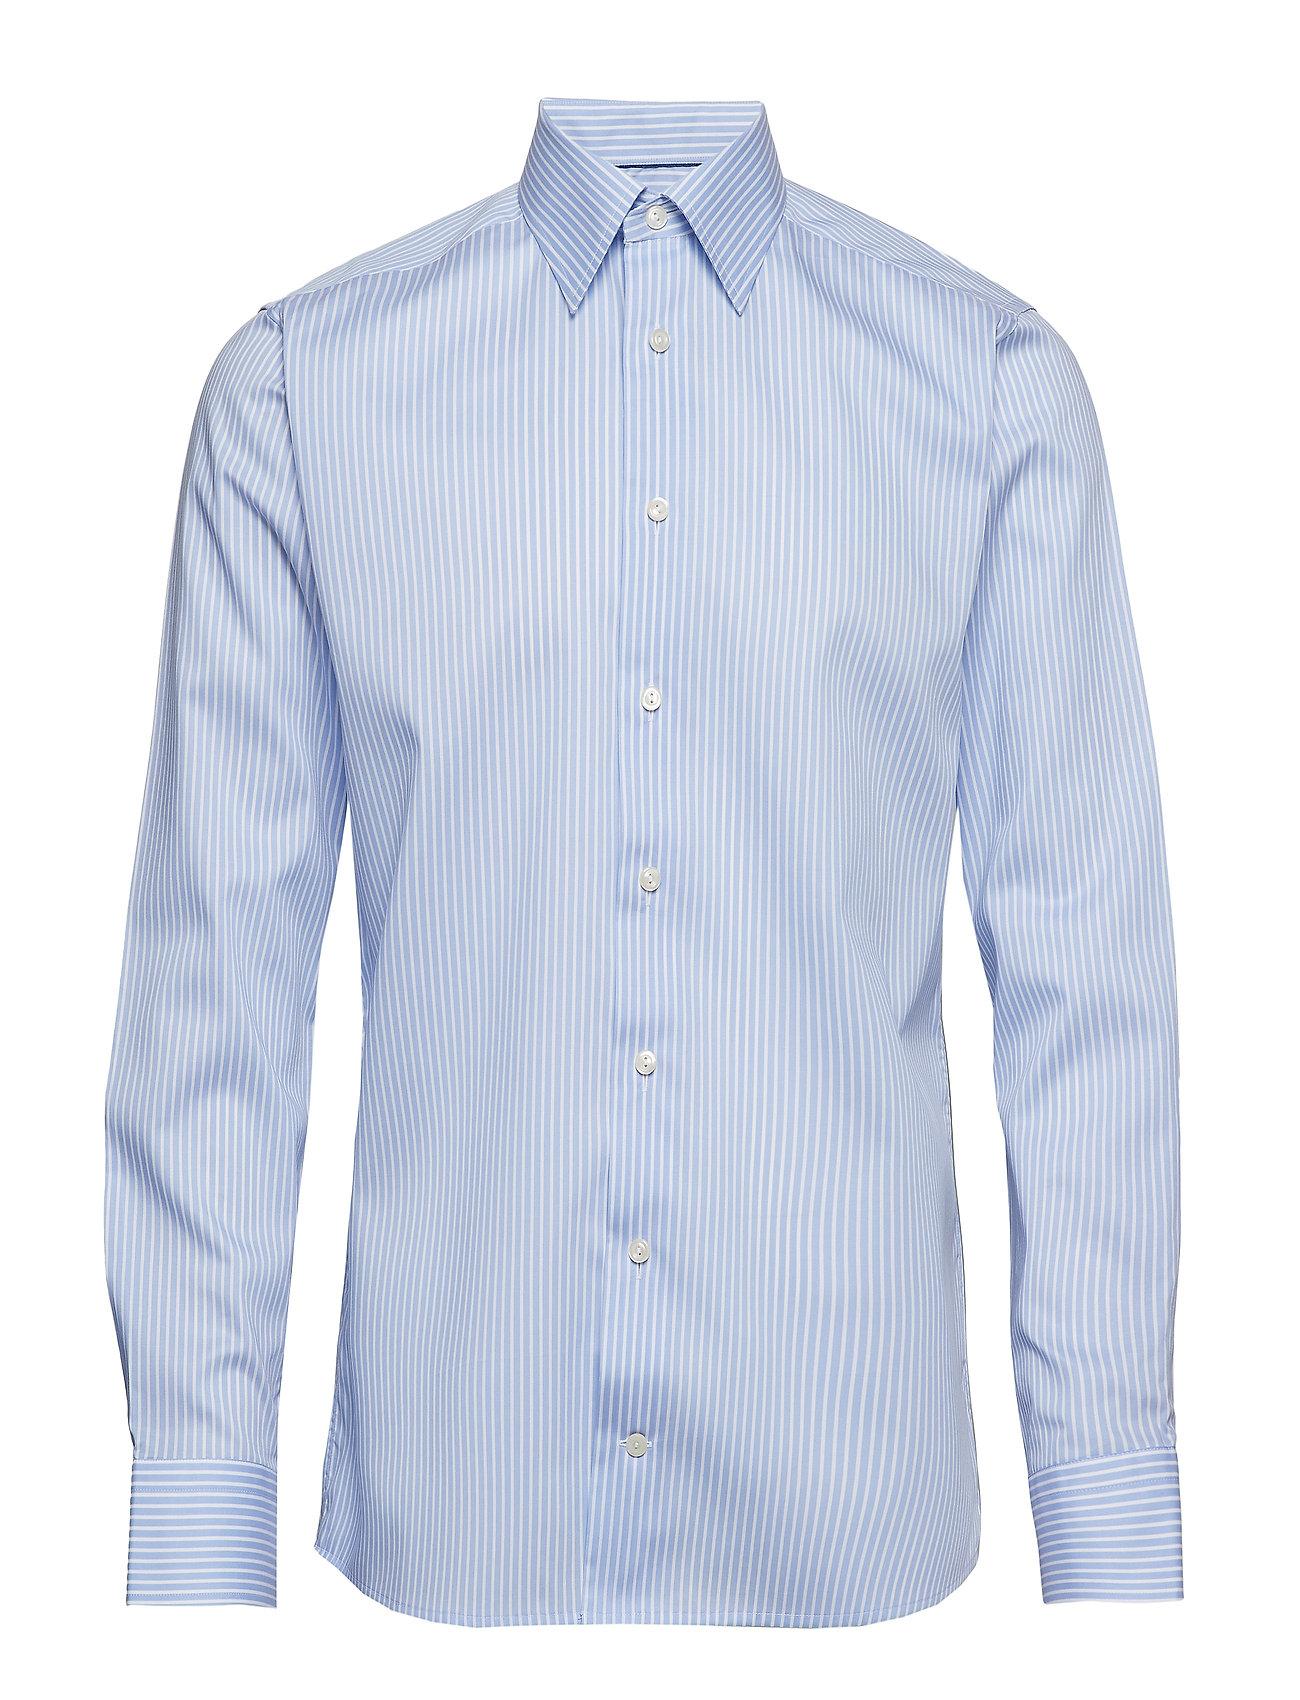 Eton Green Striped Natural Stretch Shirt